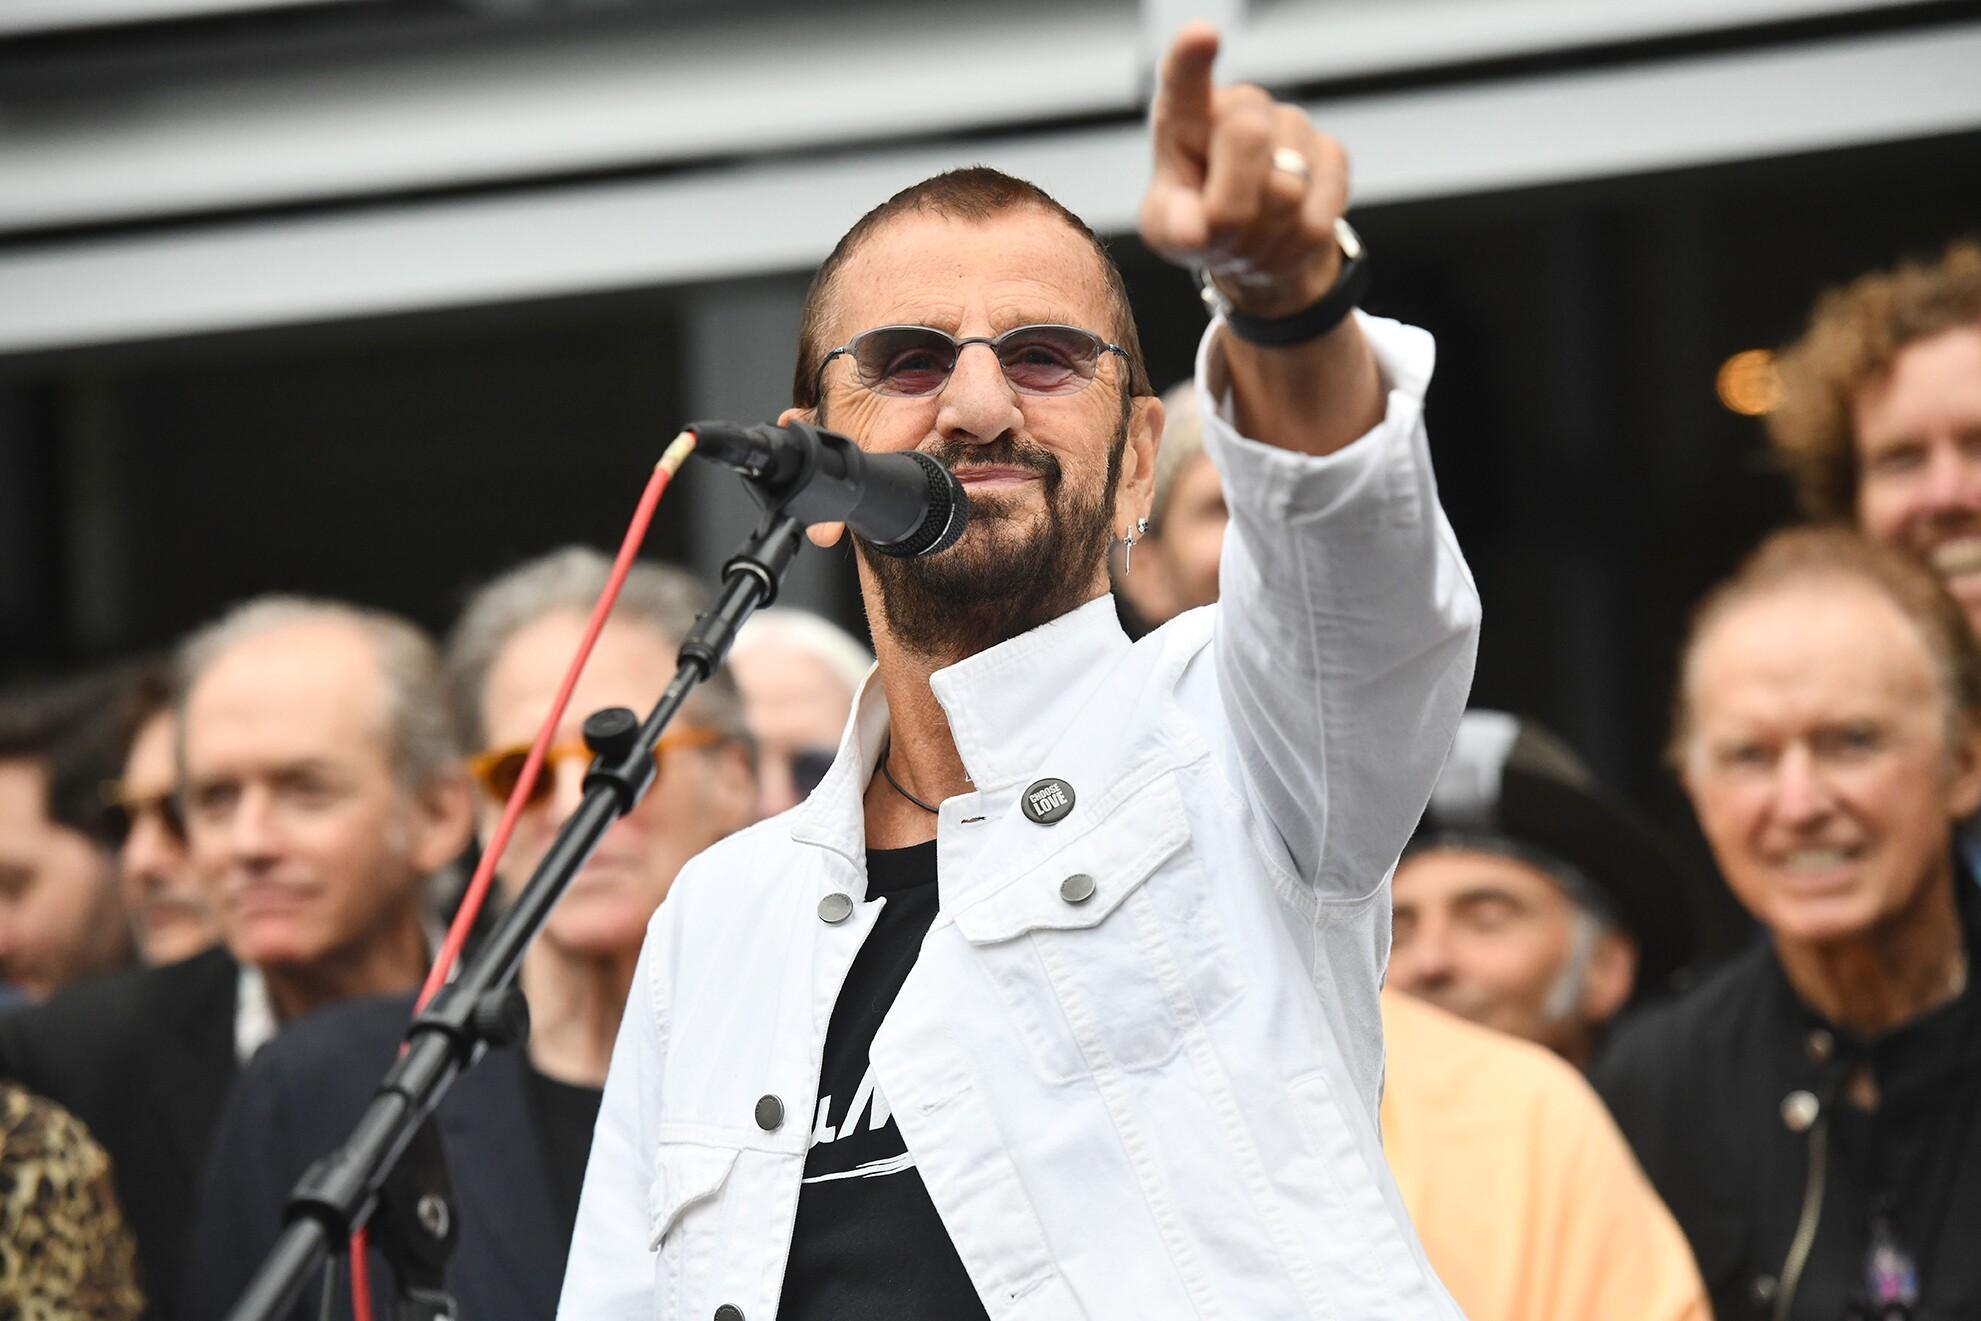 Ringo, Brexit stage right